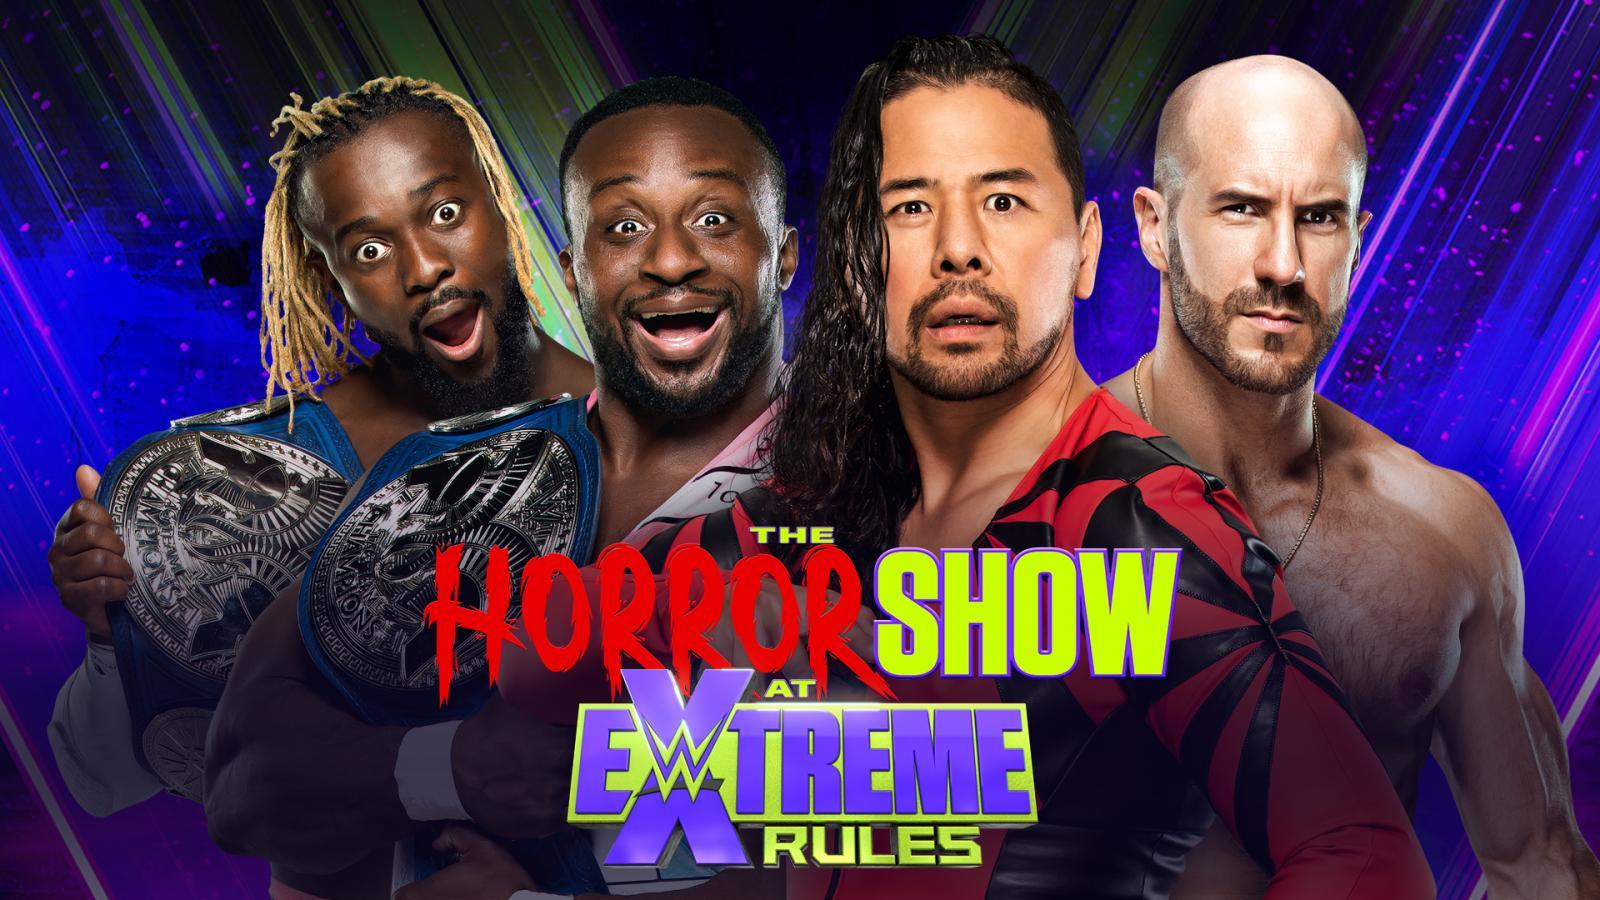 The New Day vs Shinsuke Nakamura Cesaro - WWE Extreme Rules 2020 (SmackDown Tag Team Championship Match)